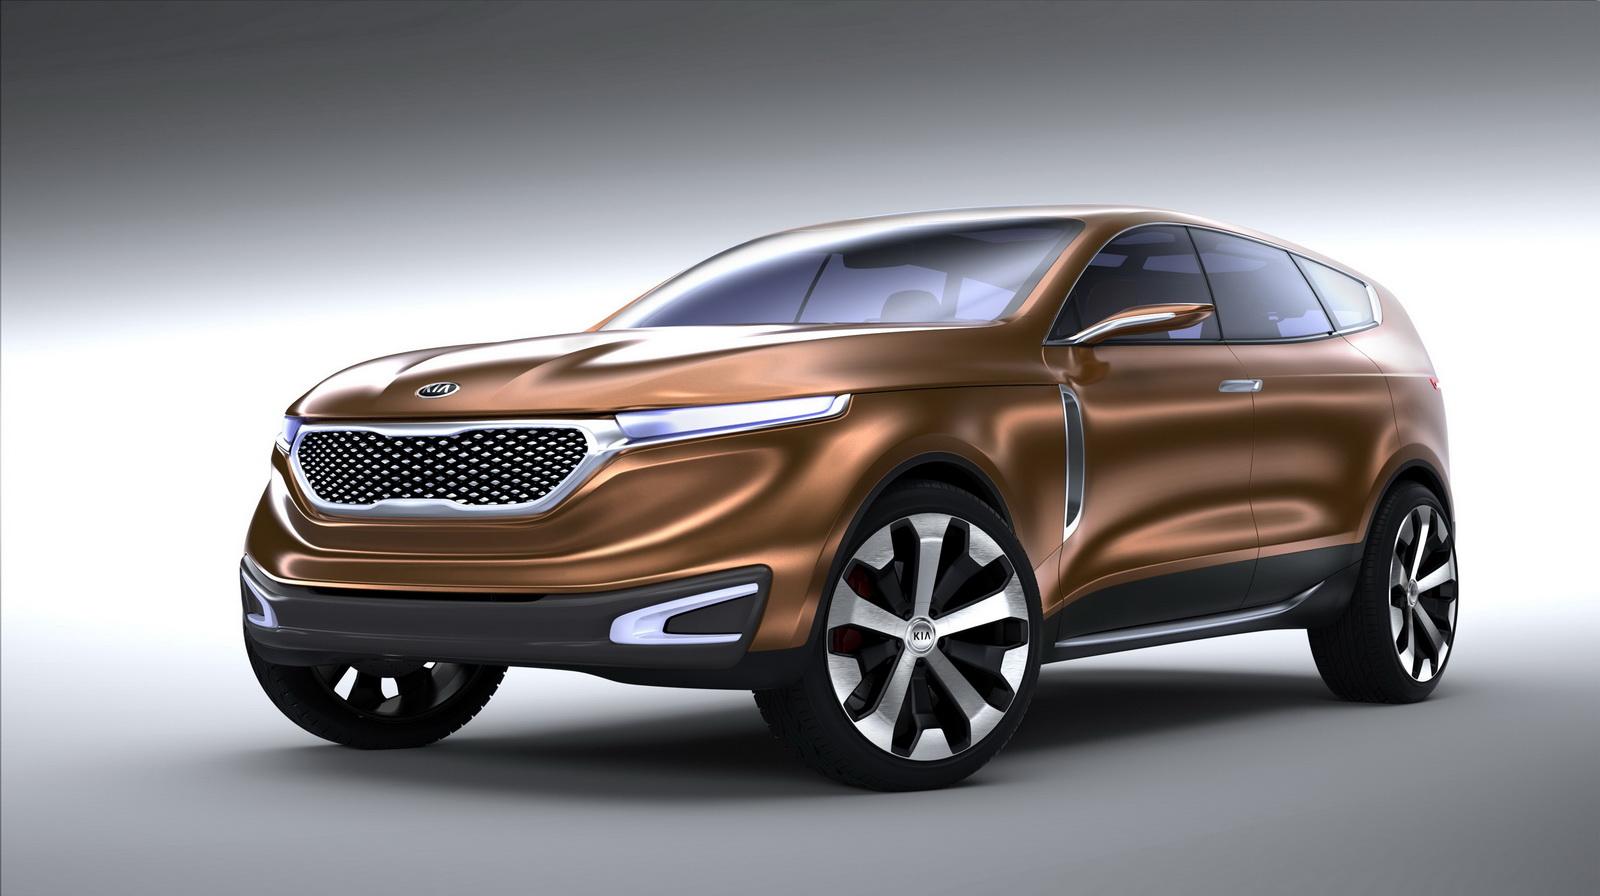 kia unveils cross gt concept at chicago auto show auto car best car news and reviews. Black Bedroom Furniture Sets. Home Design Ideas